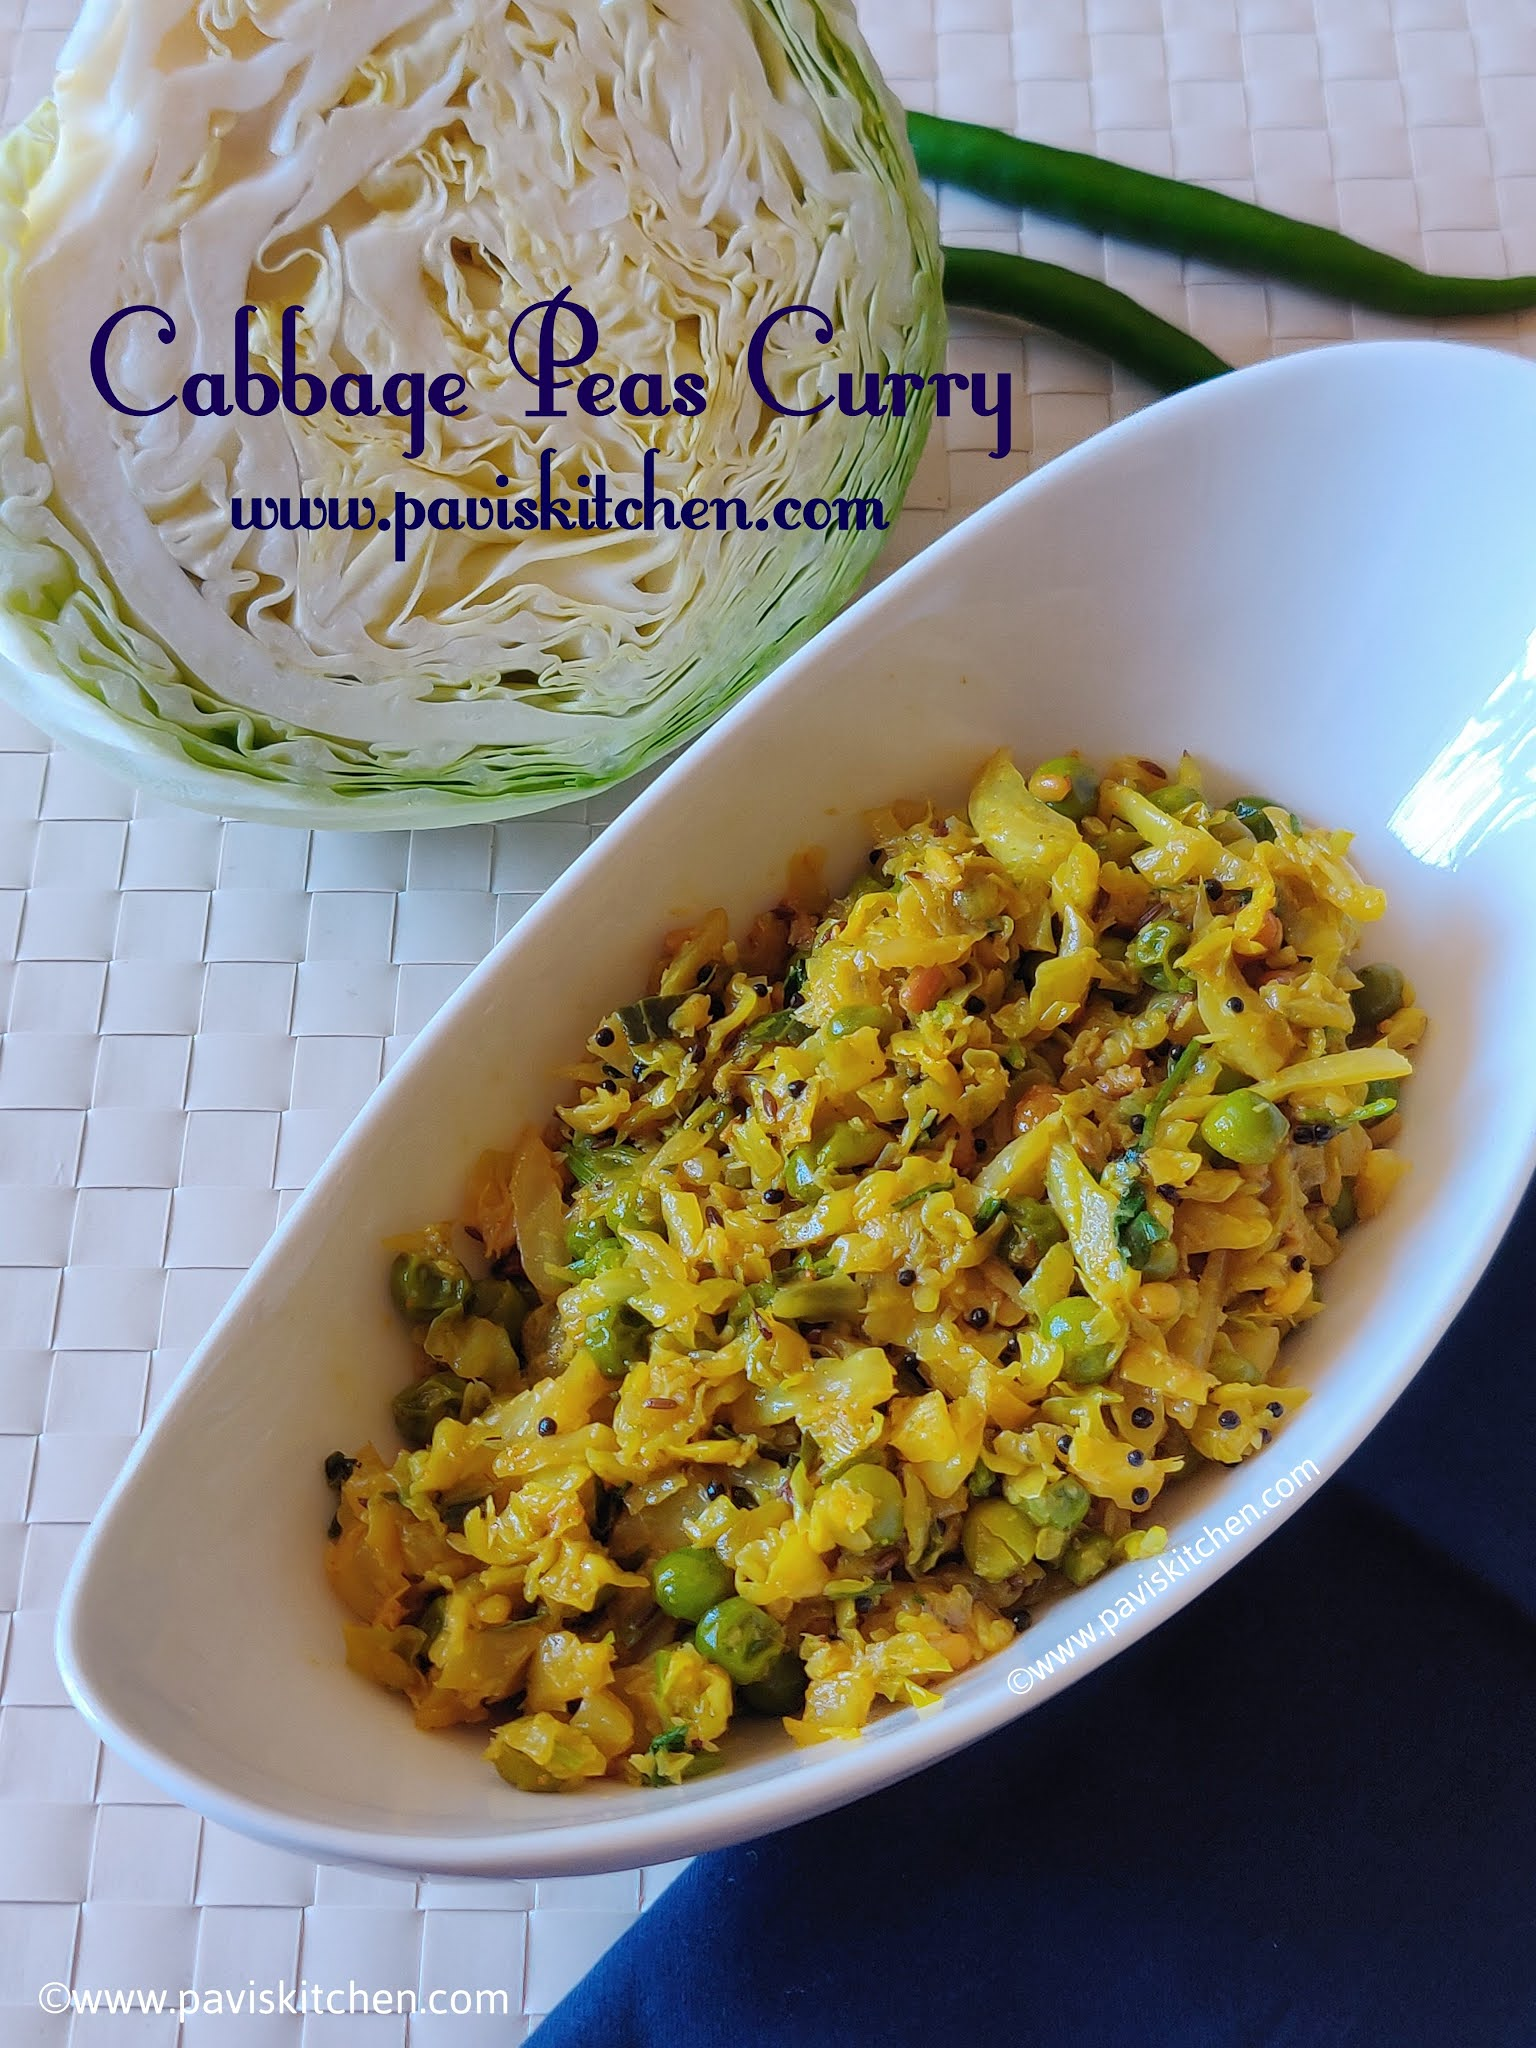 Patta gobhi matar recipe | band gobi matar recipe | Cabbage green peas sabzi Punjabi recipe